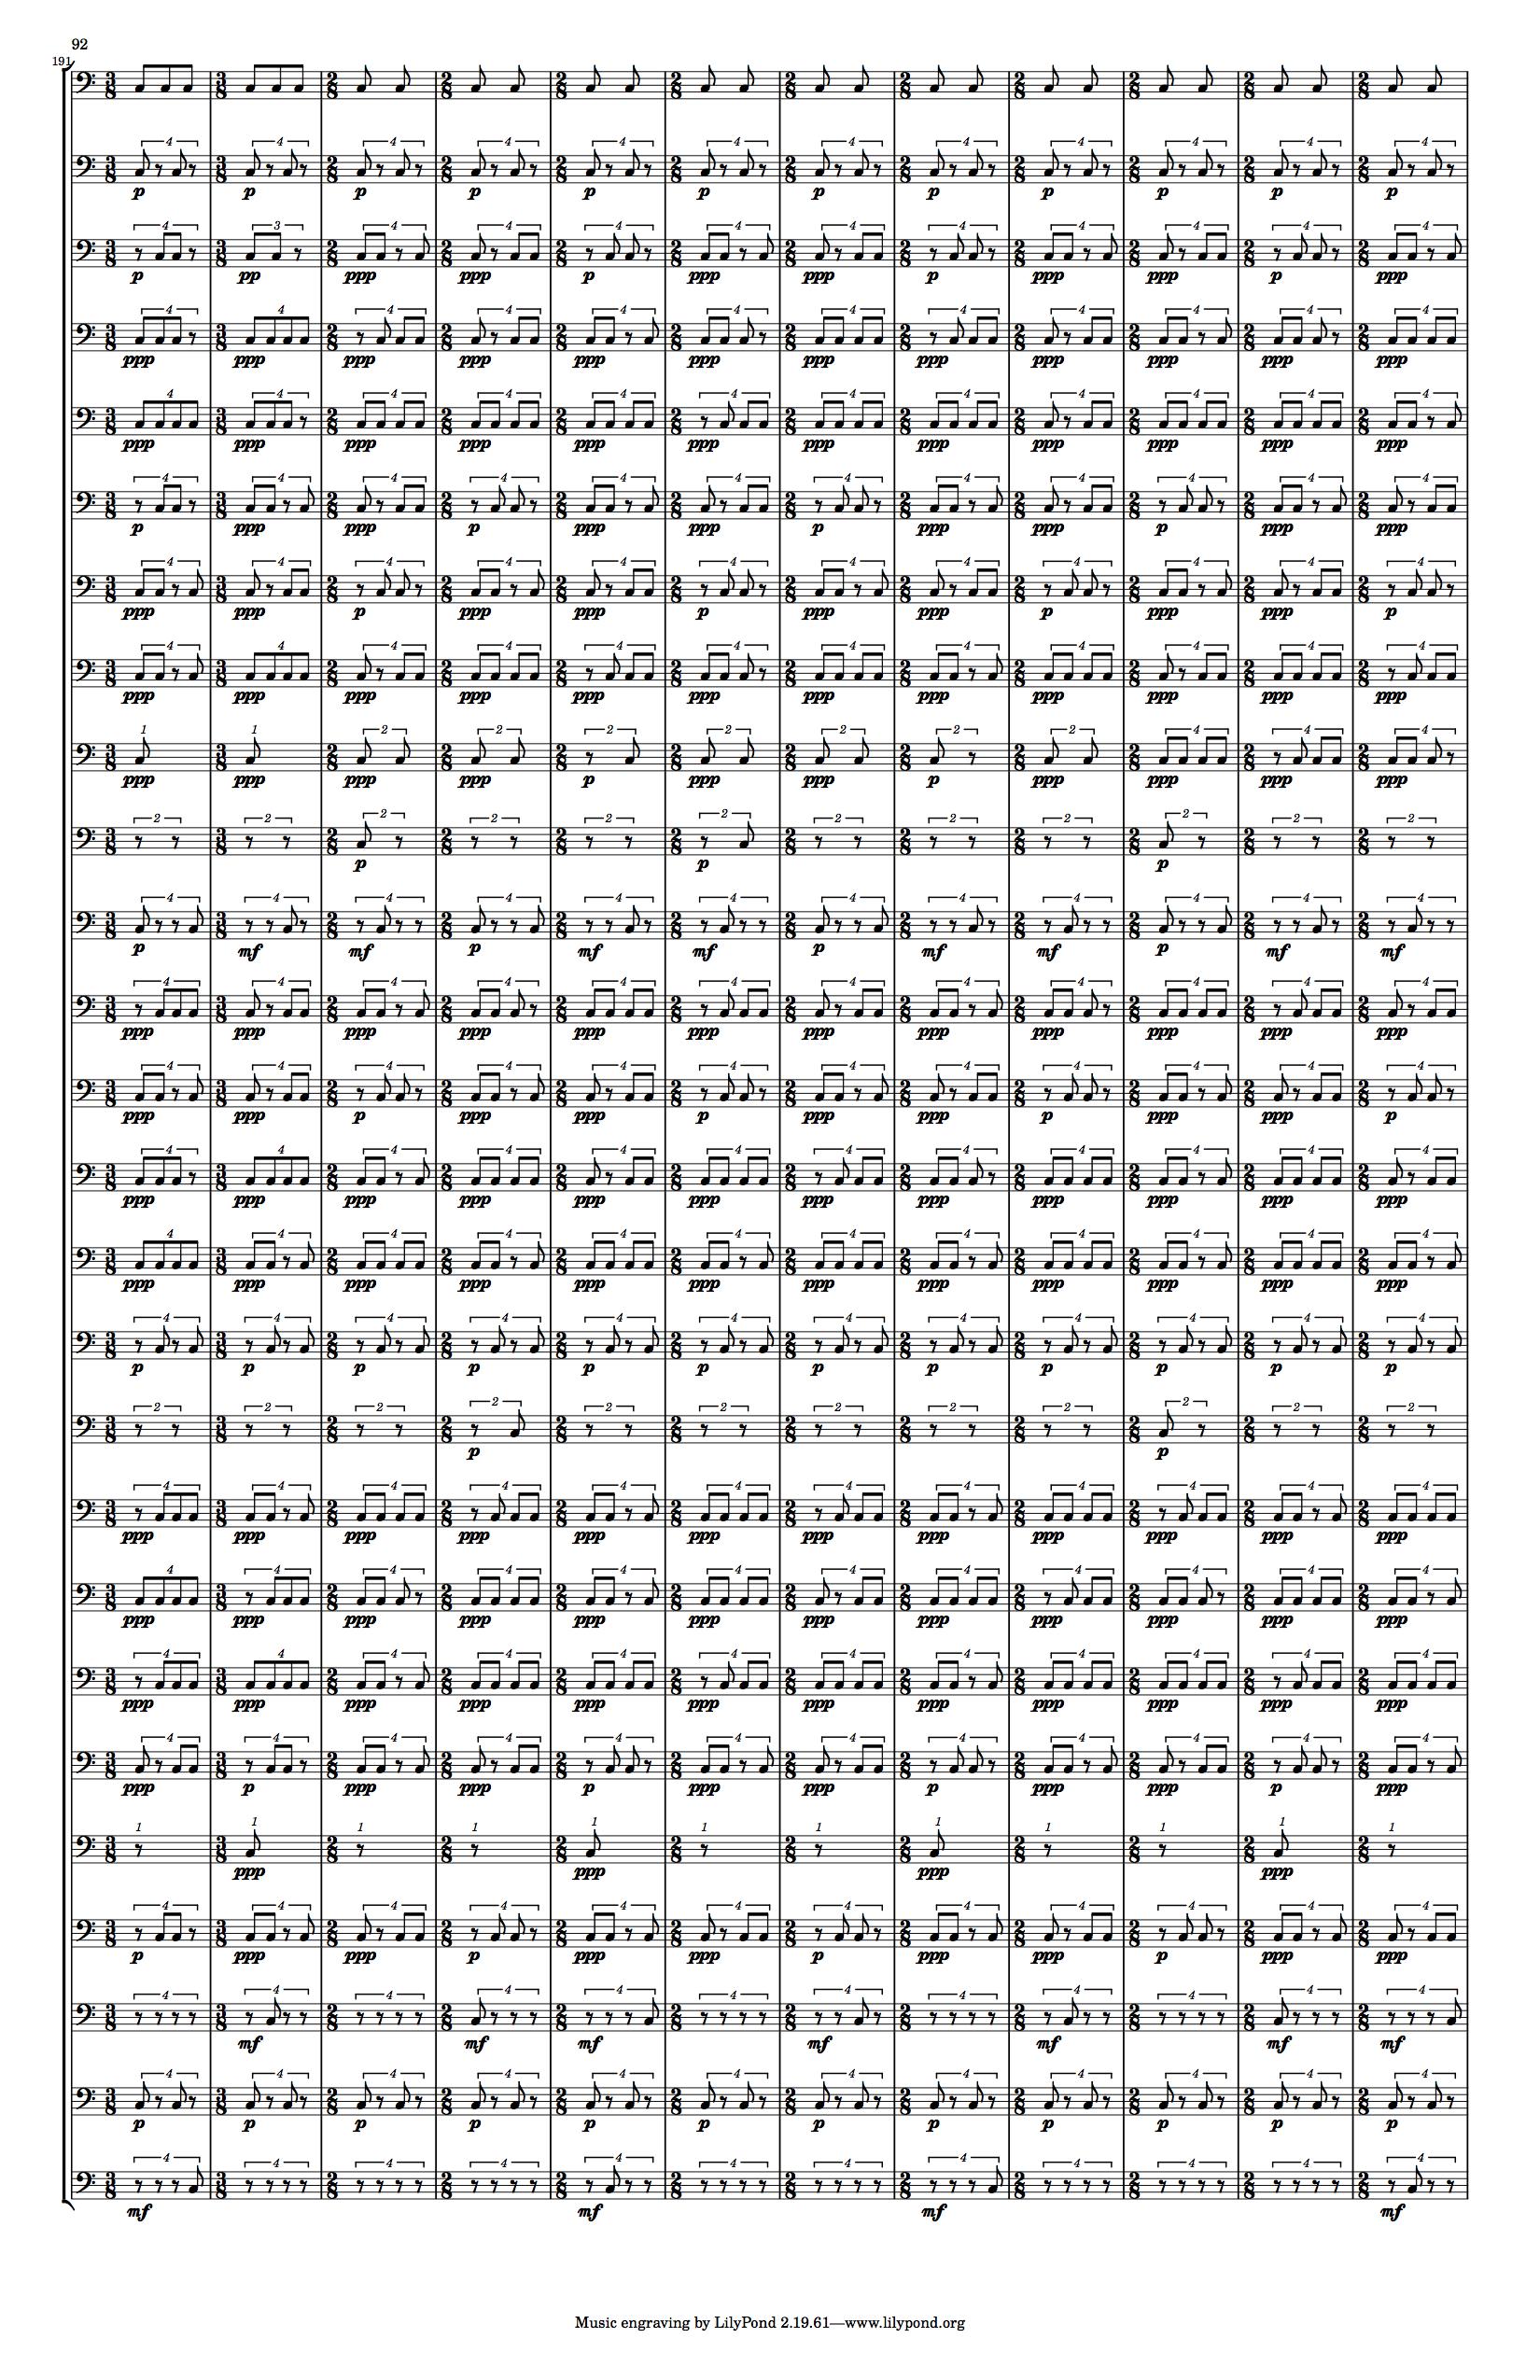 dynamics/v2/page92